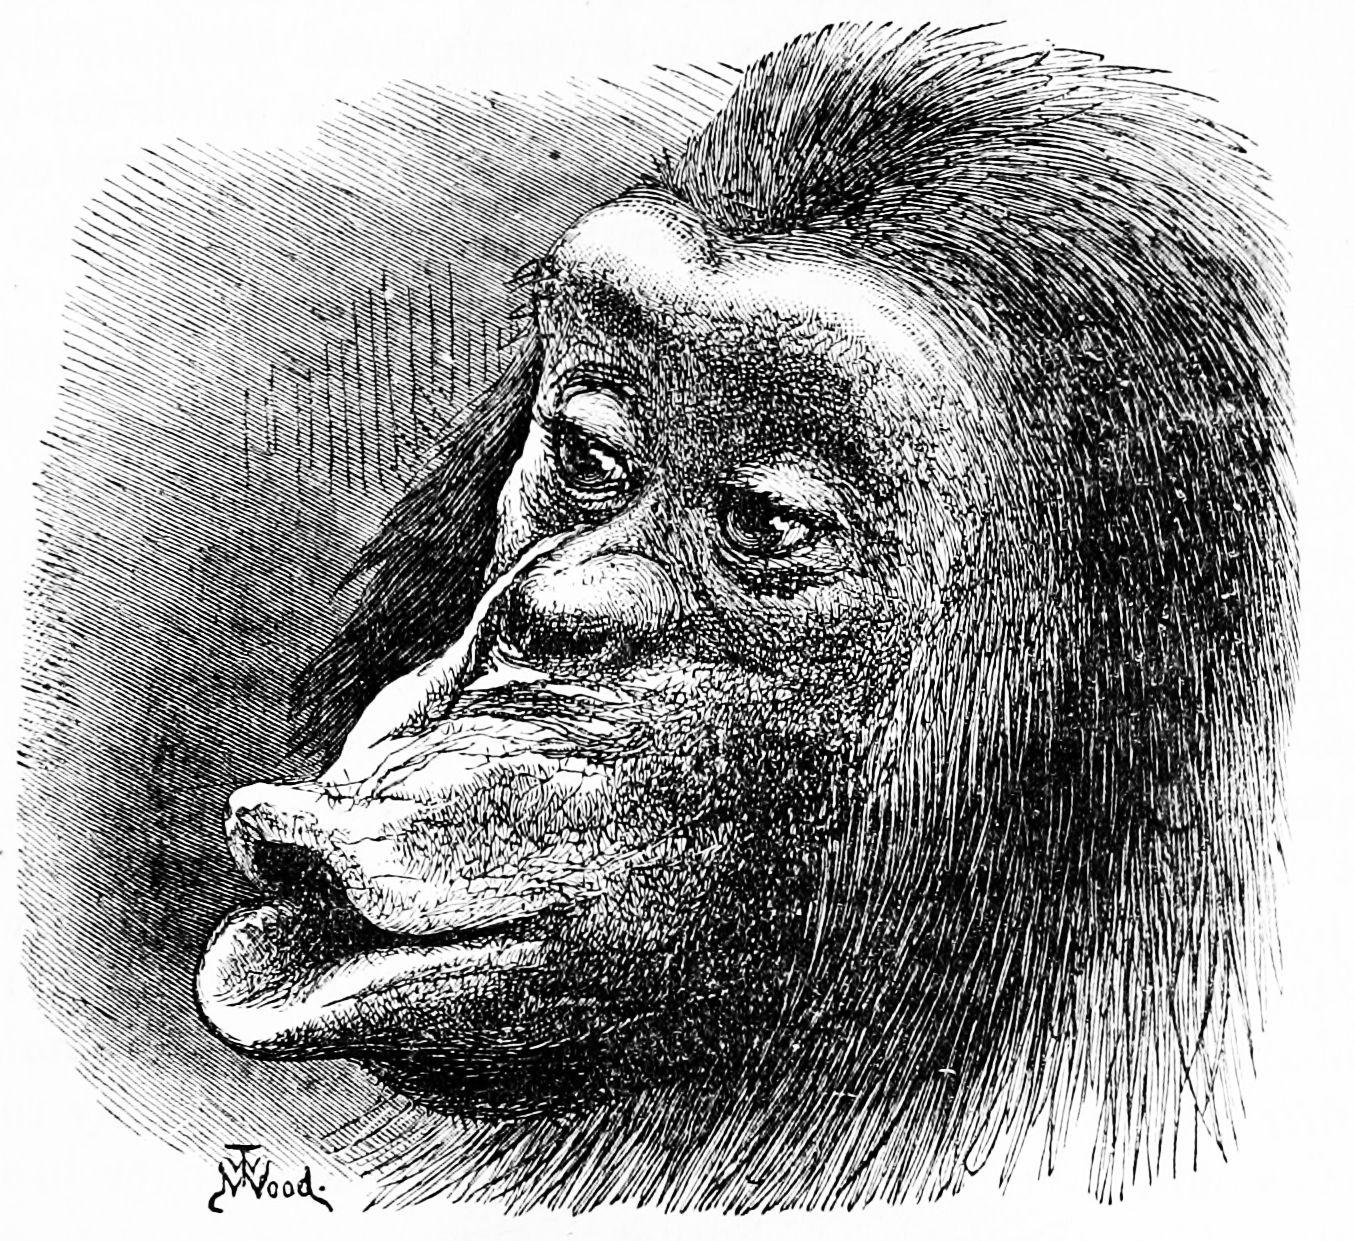 PSM_V02_D465_Sulky_chimpanzee